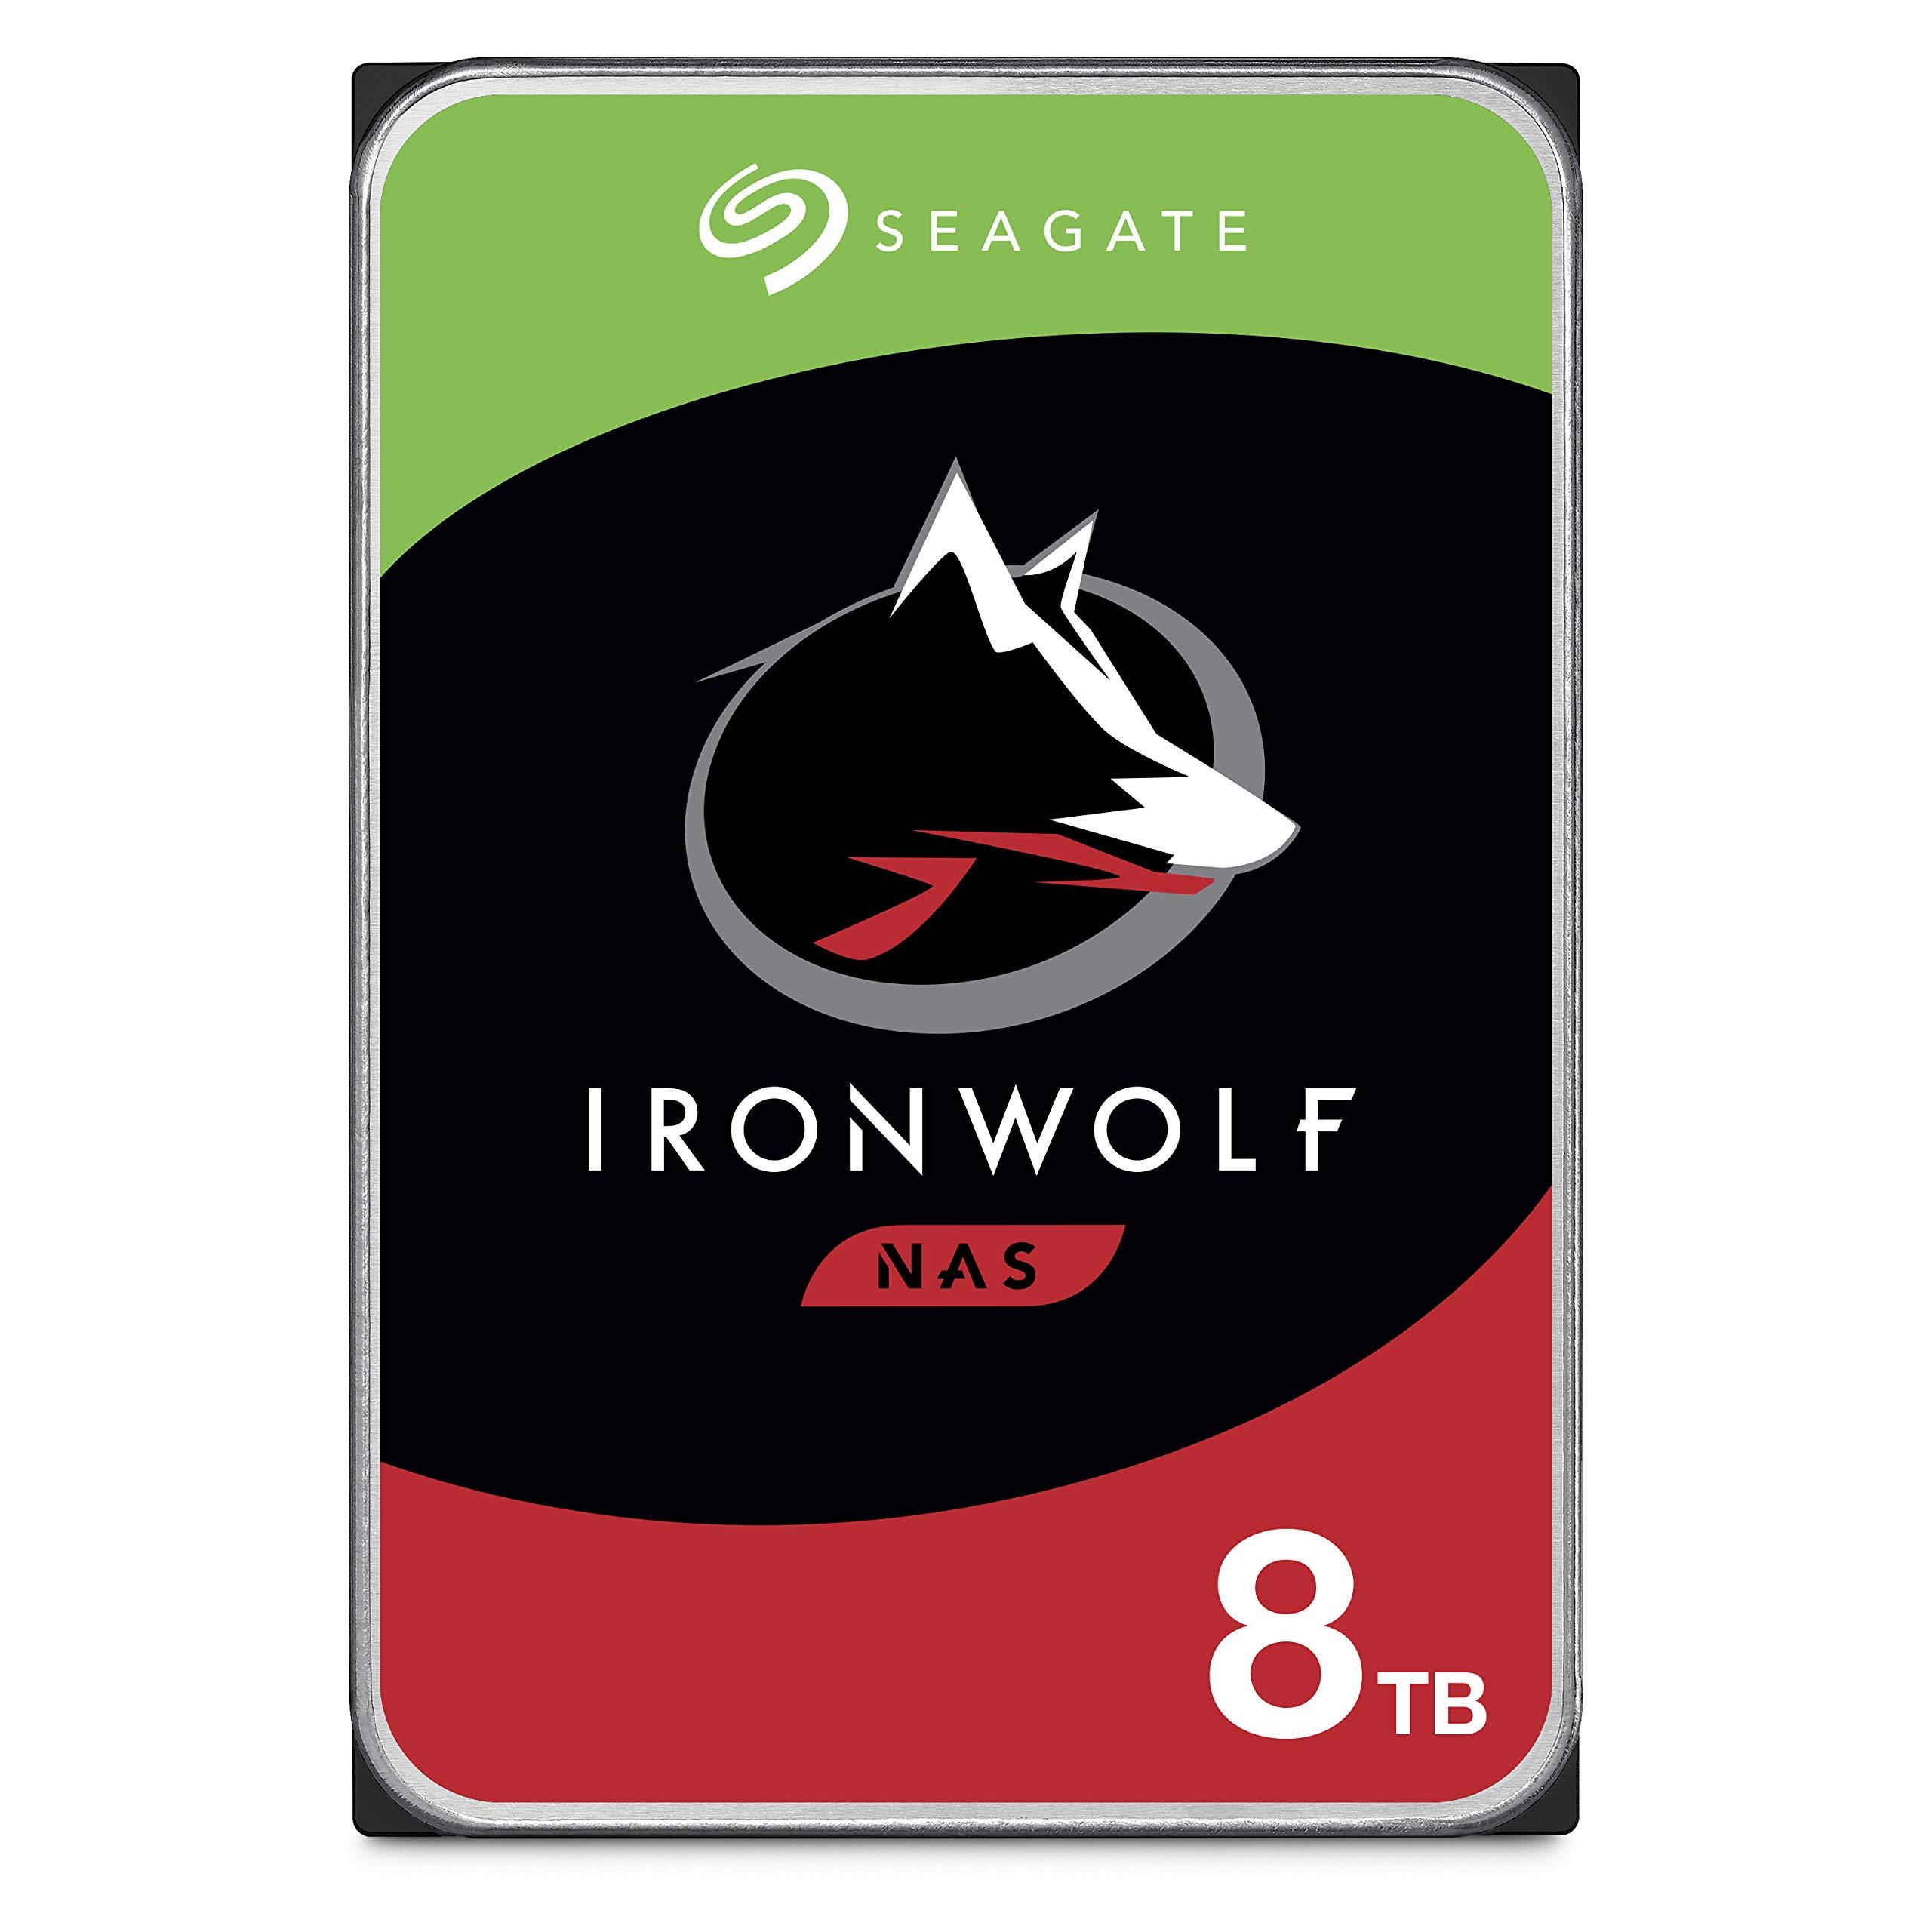 HDD 8TB SATA Seagate IronWolf 8TB NAS 3.5in 6Gb/s 7200 RPM 2